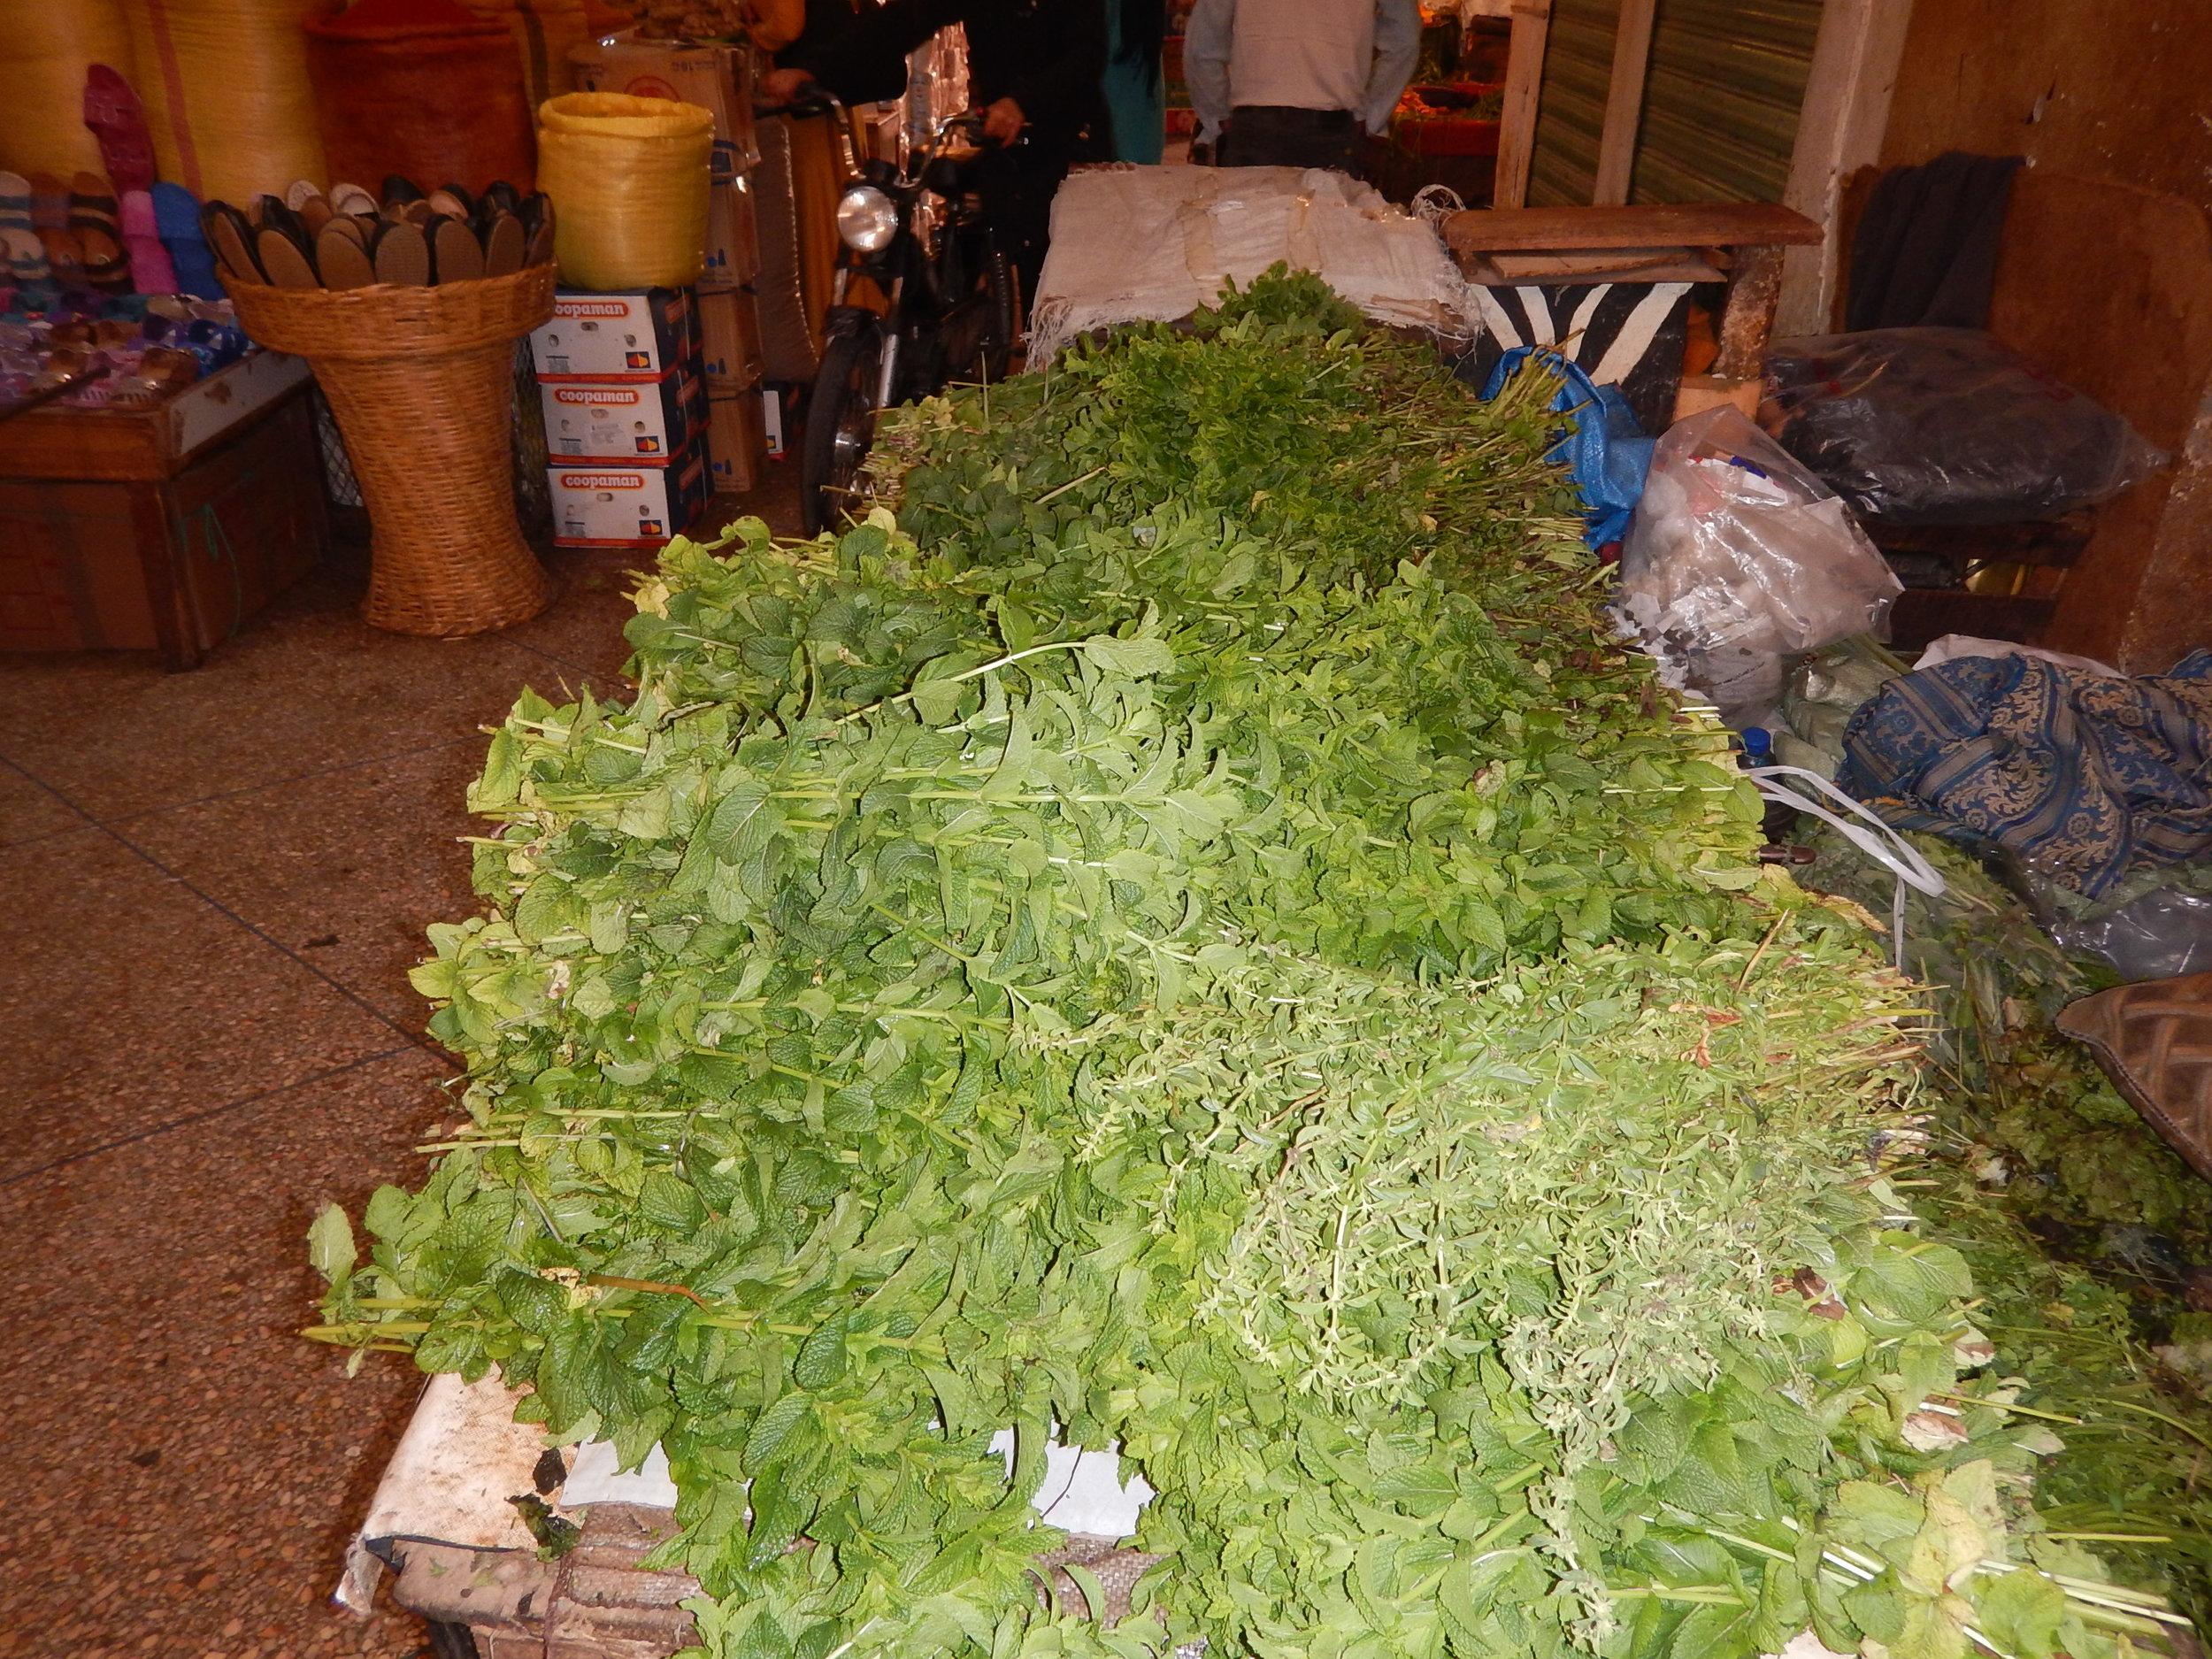 barrow load of fresh picked tea at the night market.